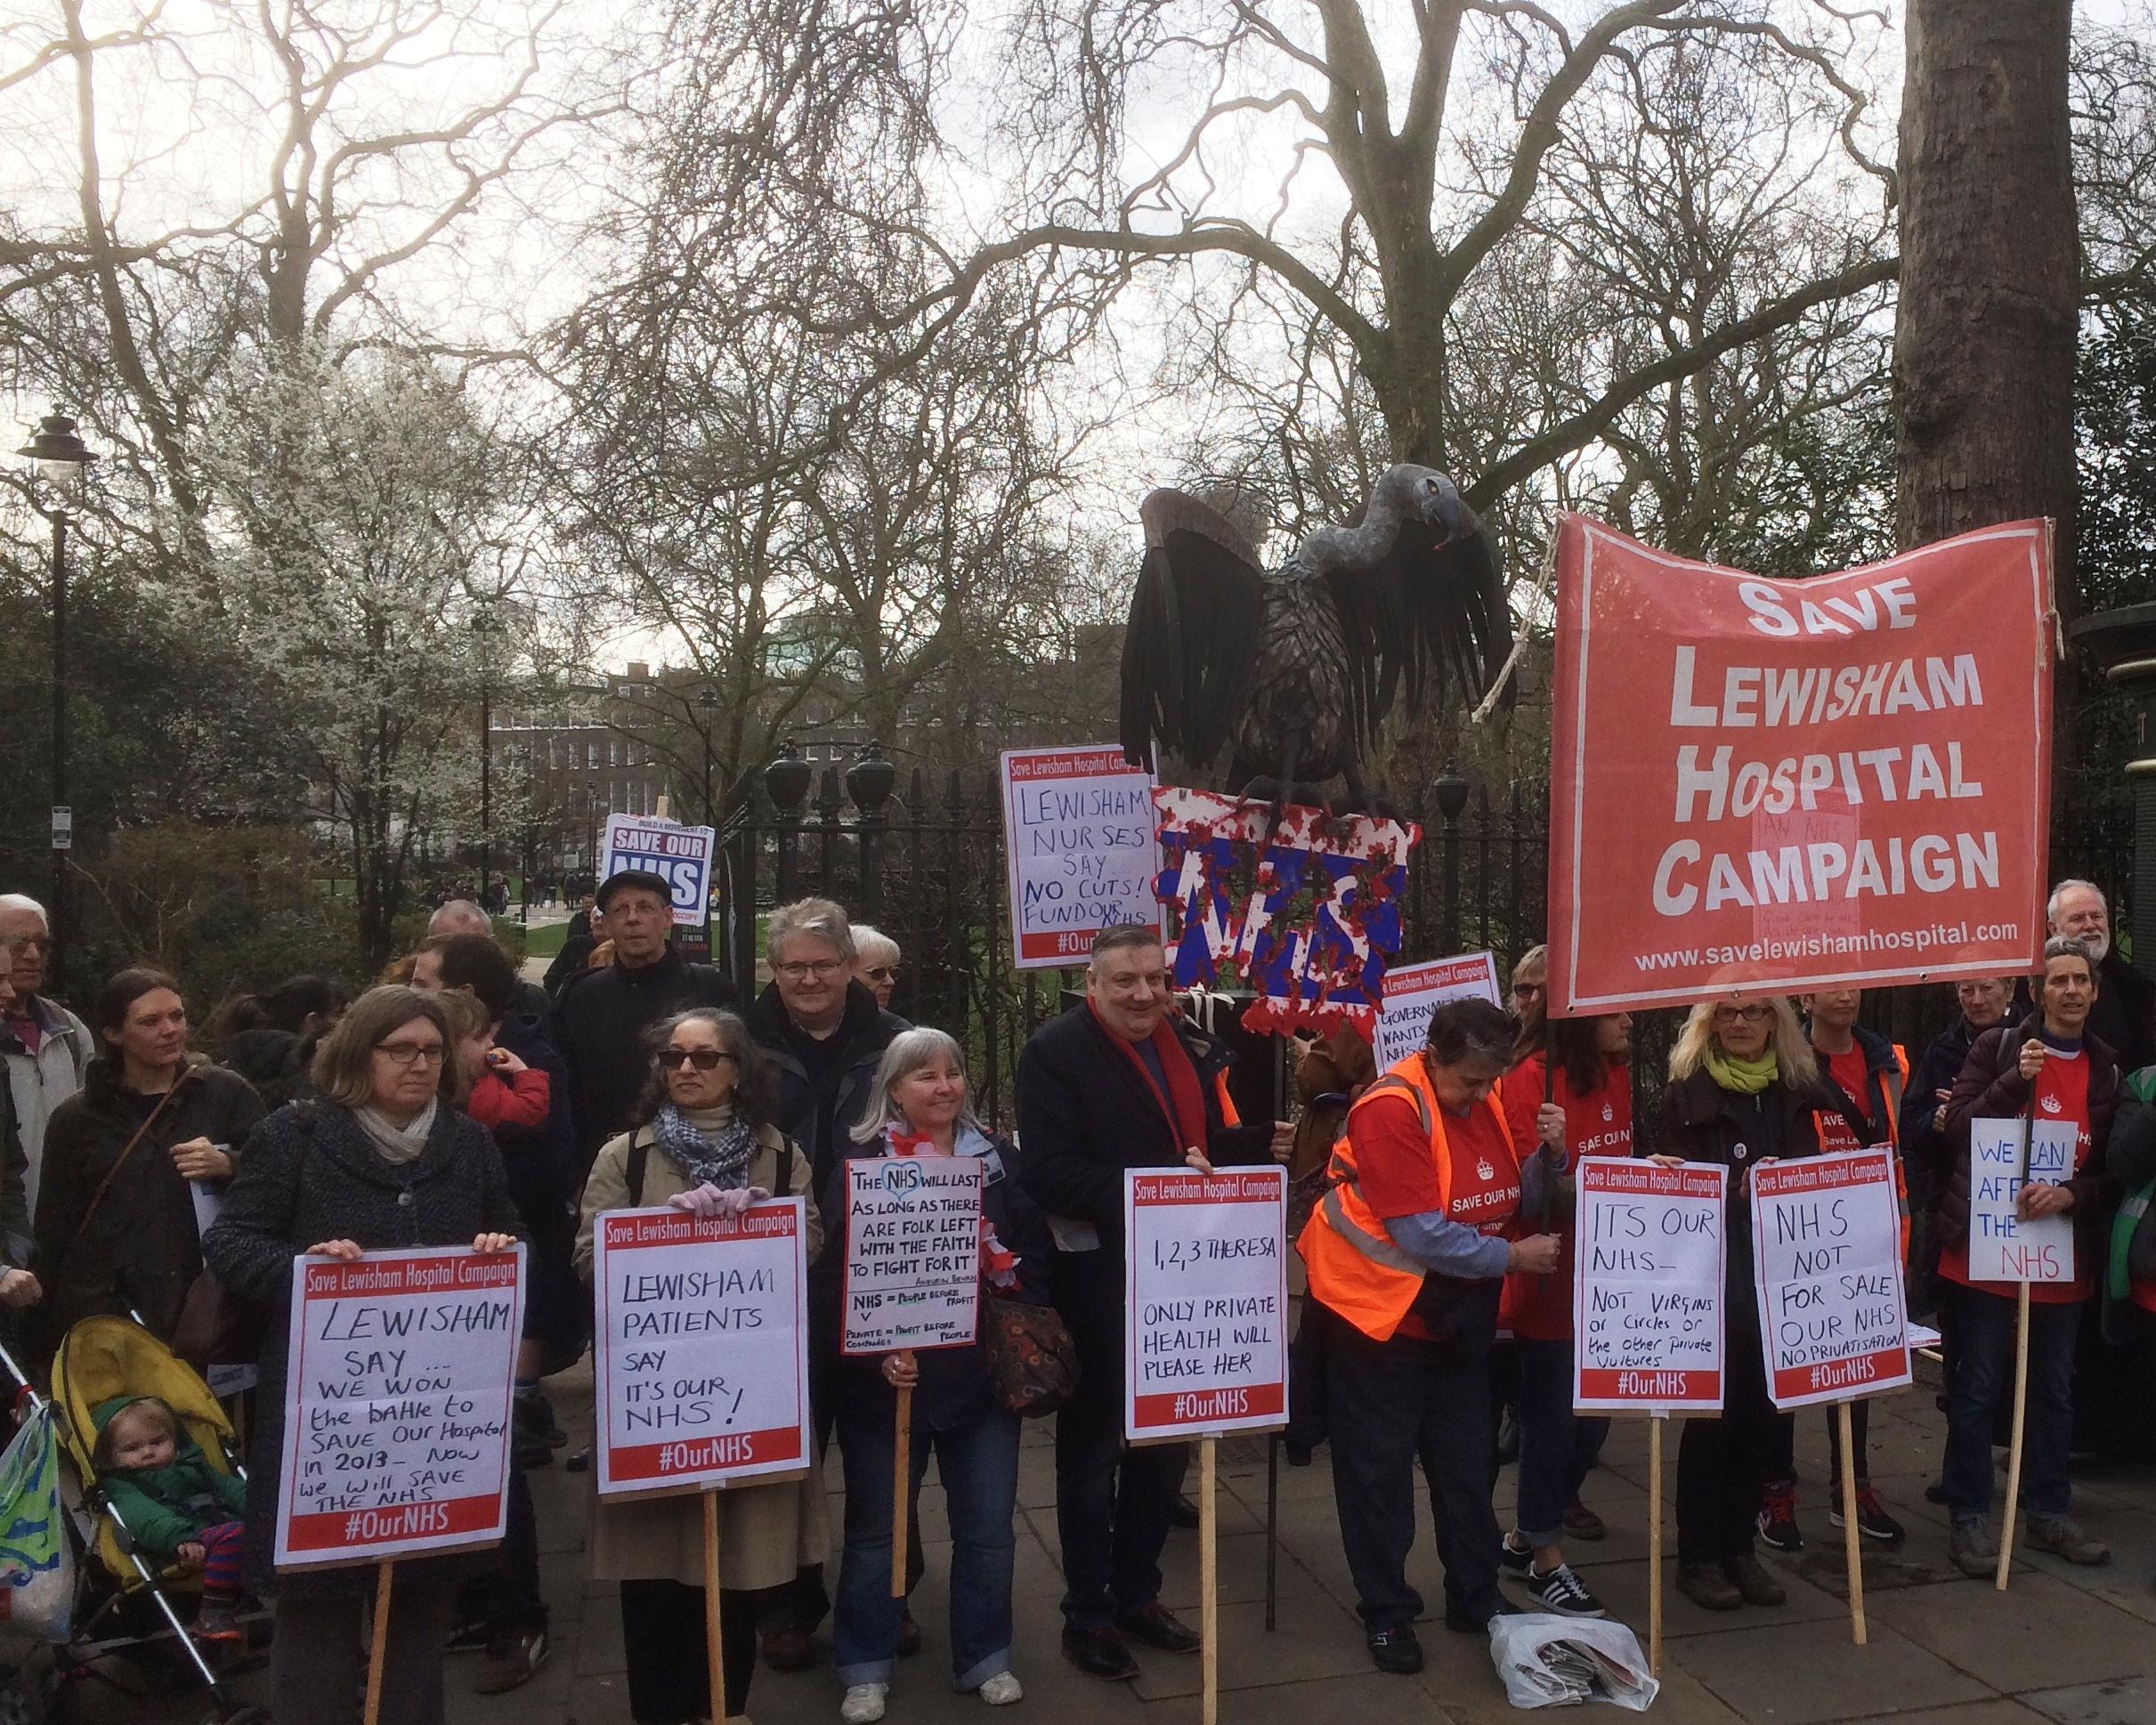 nhs-demo-sat-040317-save-lewisham-hospital-campaigners